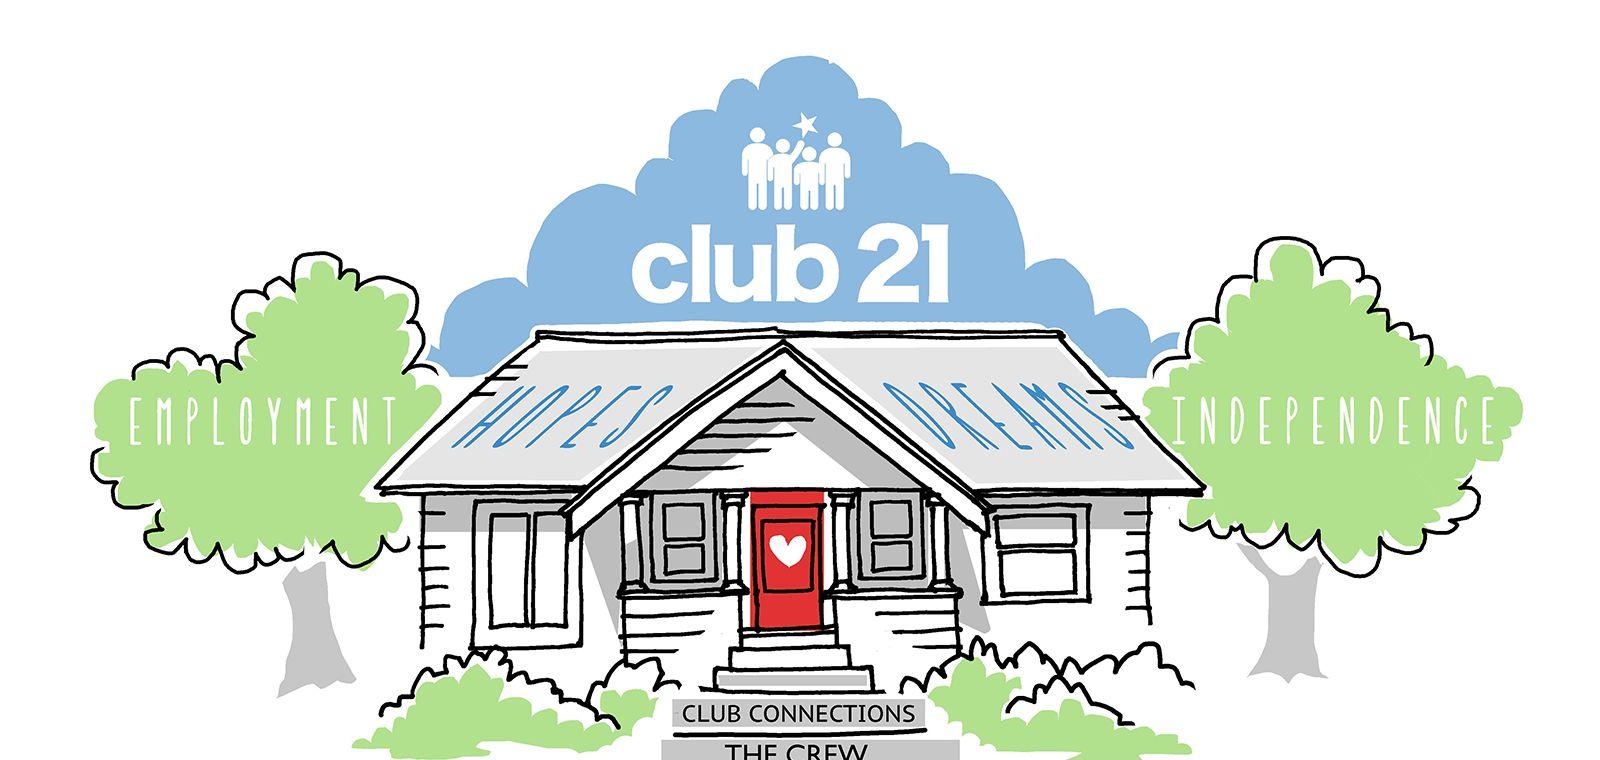 Club 21 Classes are now VENDORED